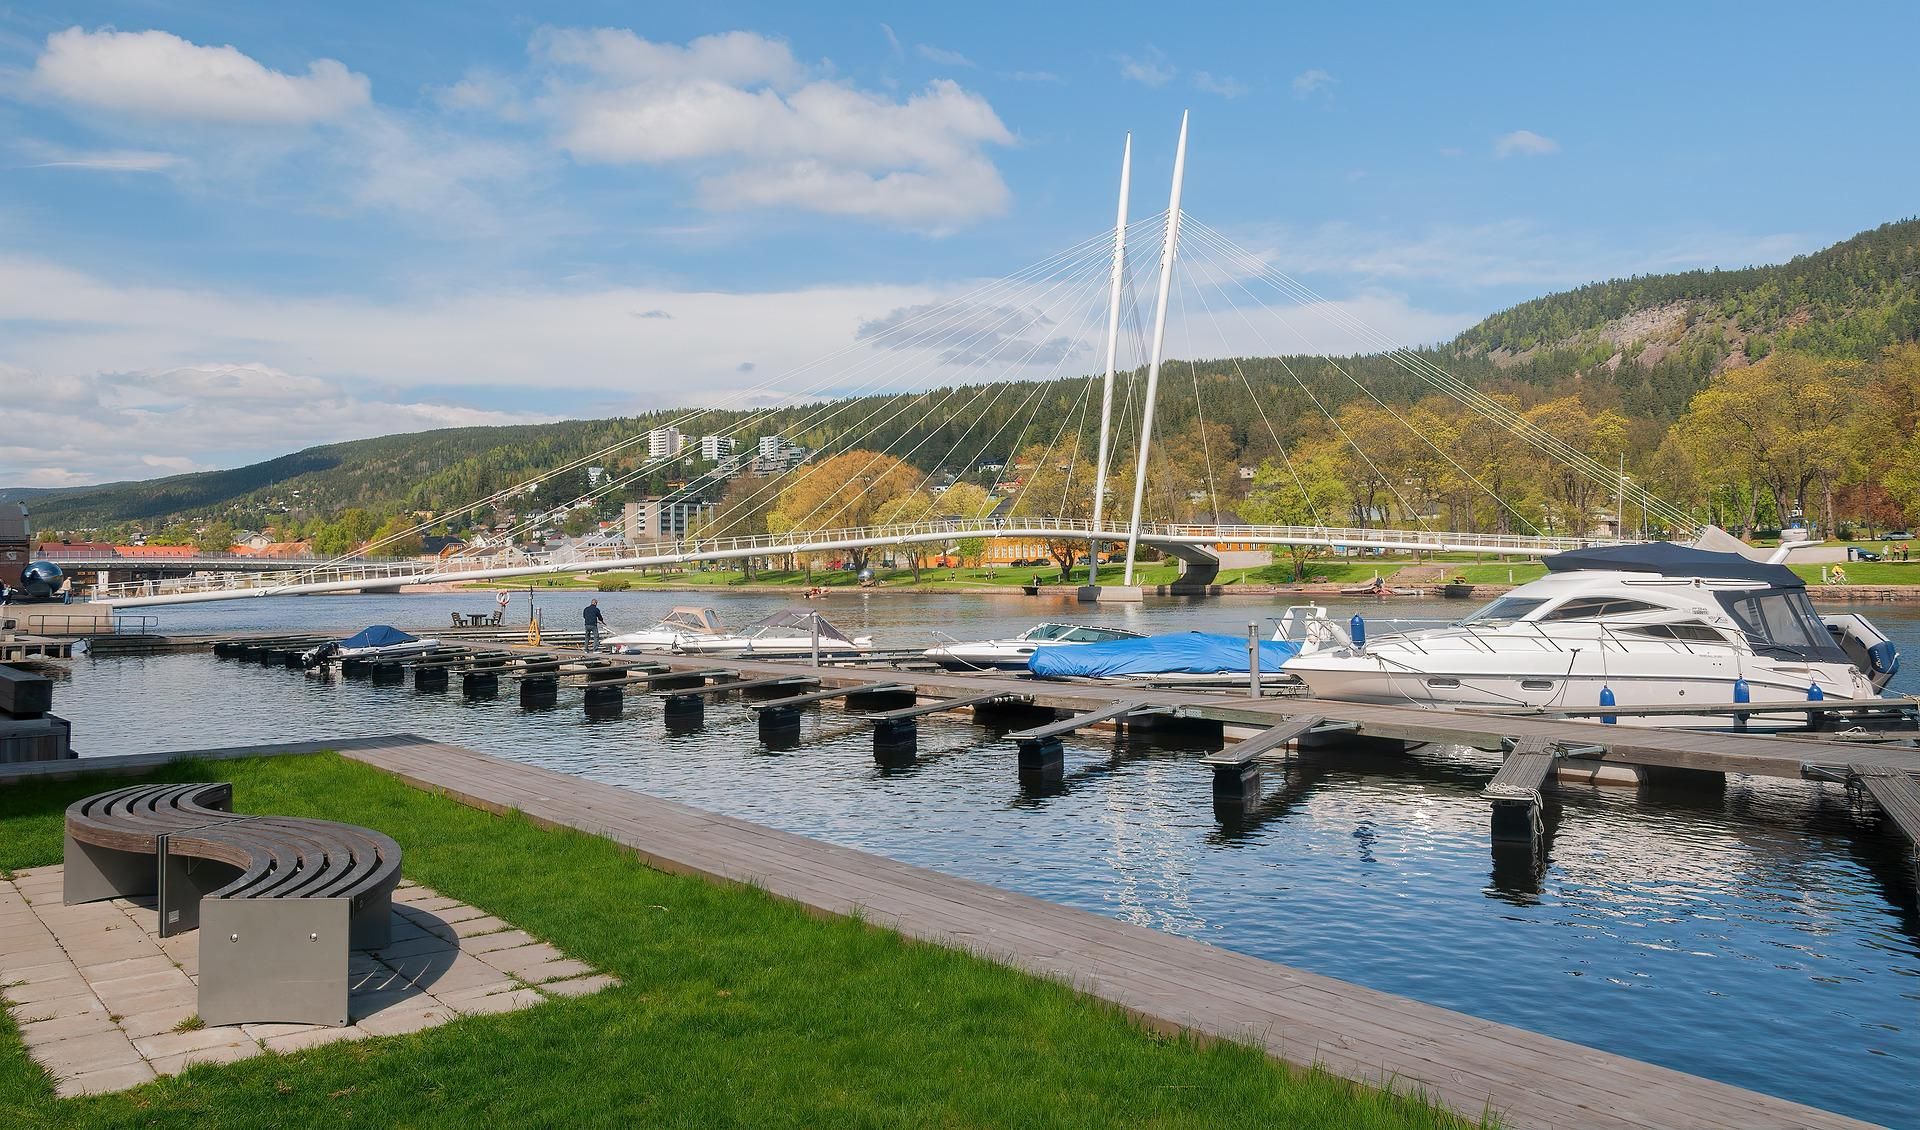 Bro og båter